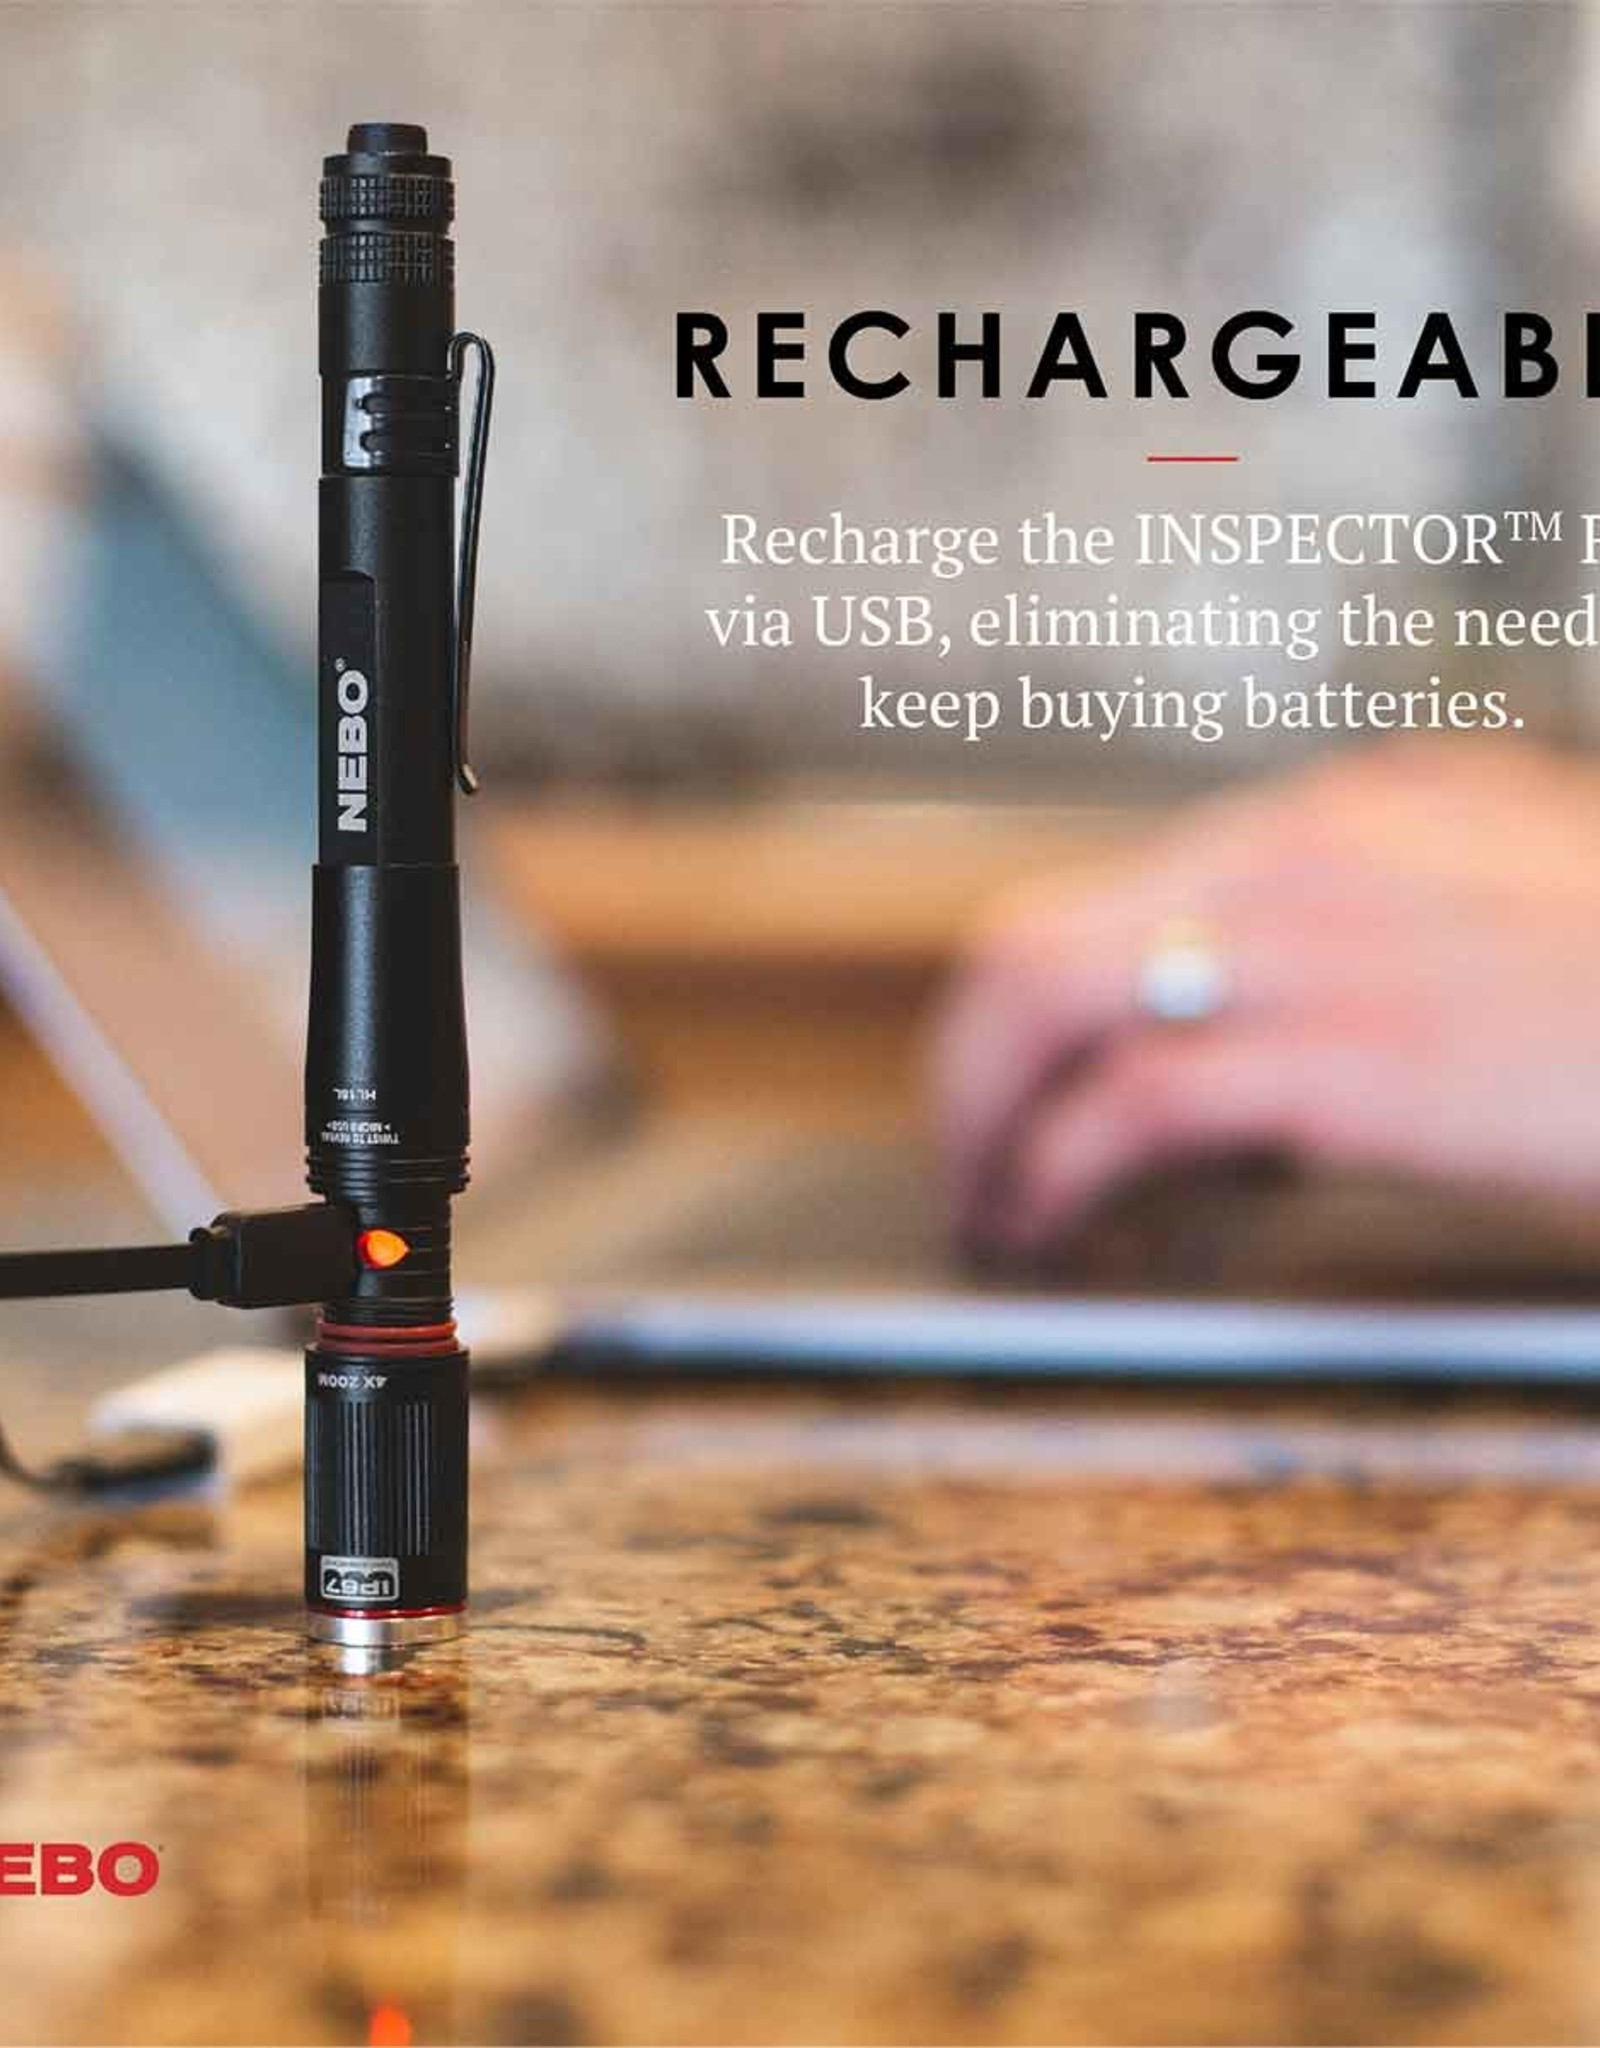 Nebo rechargeable flashlight